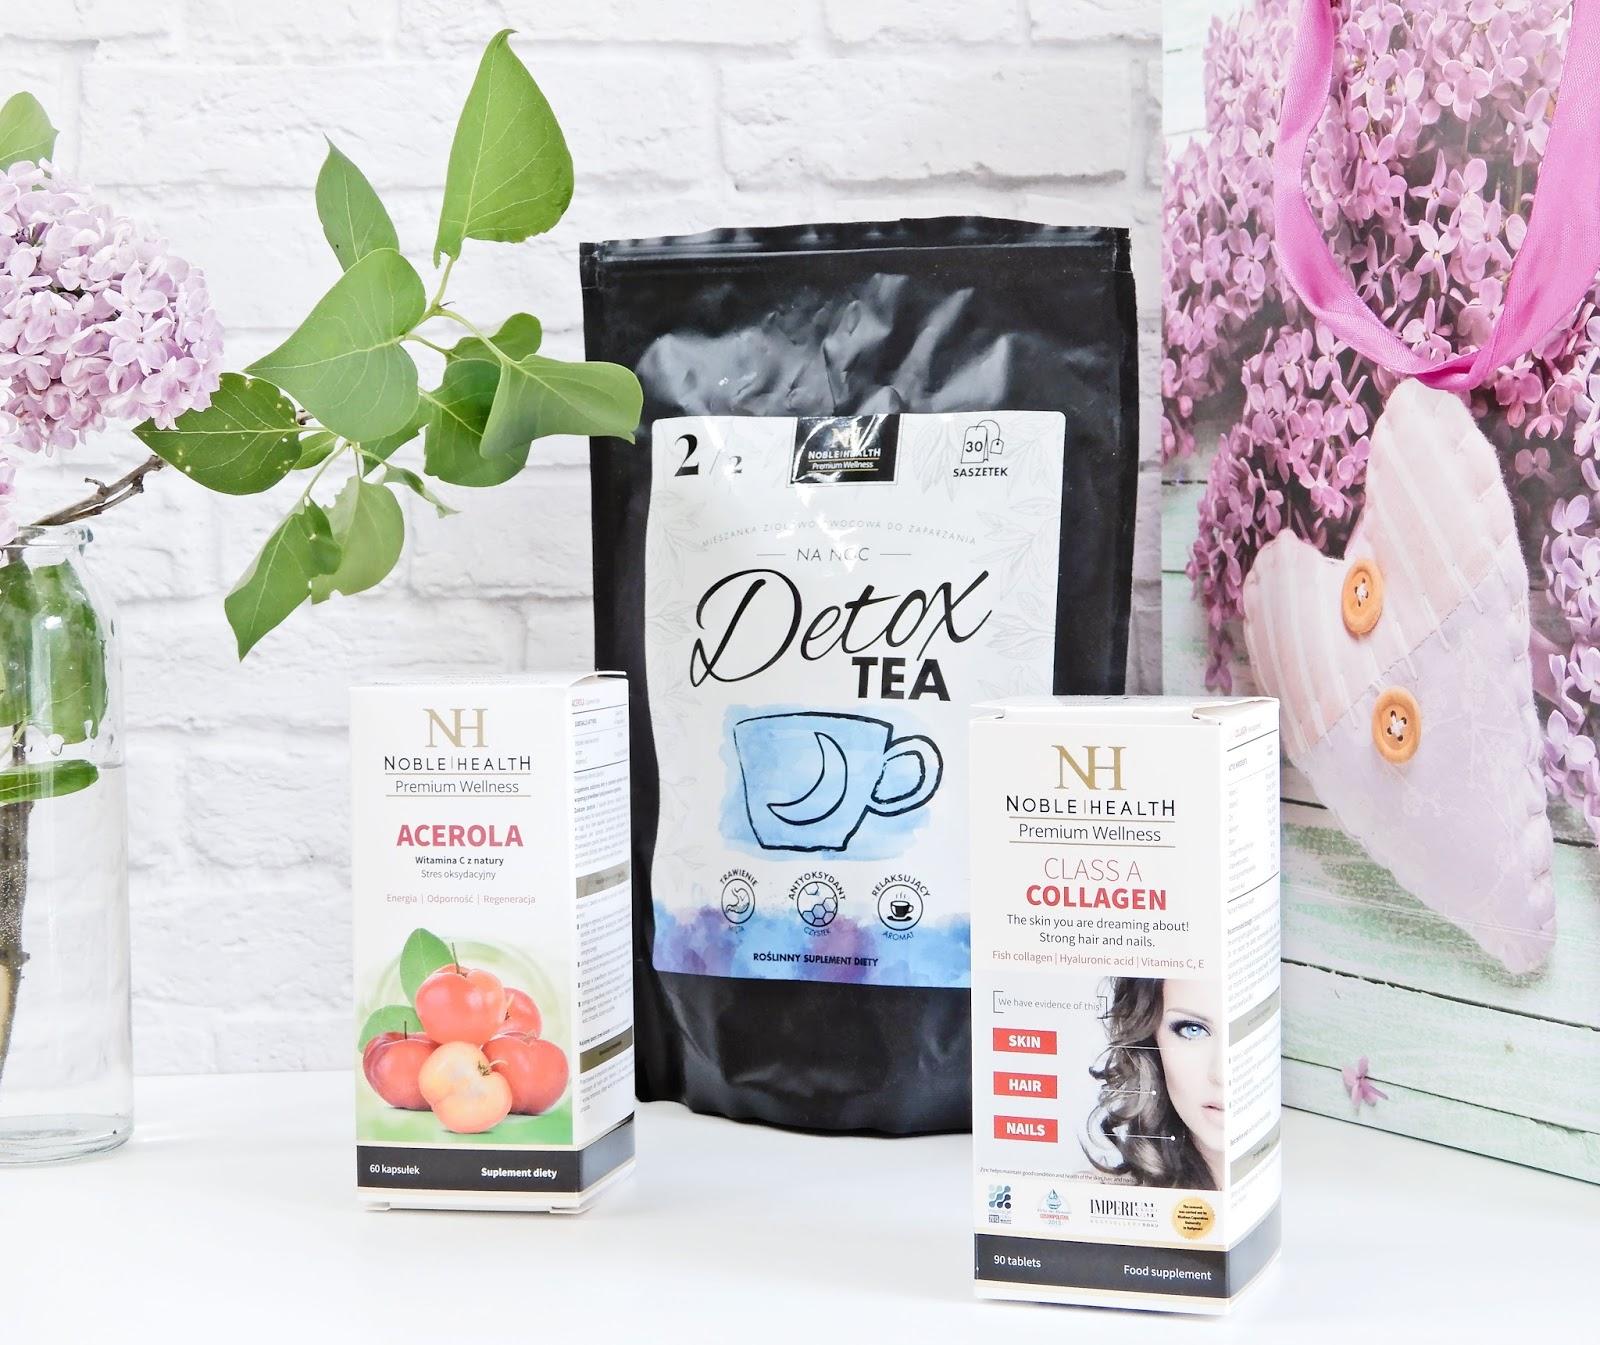 Noble Helth herbatka Detox, Noble Helth  tabletki wzmacniające skórę włosy i paznokcie CLASS A COLLAGEN, Noble Helth suplement diety Acerola, Noble Helth,